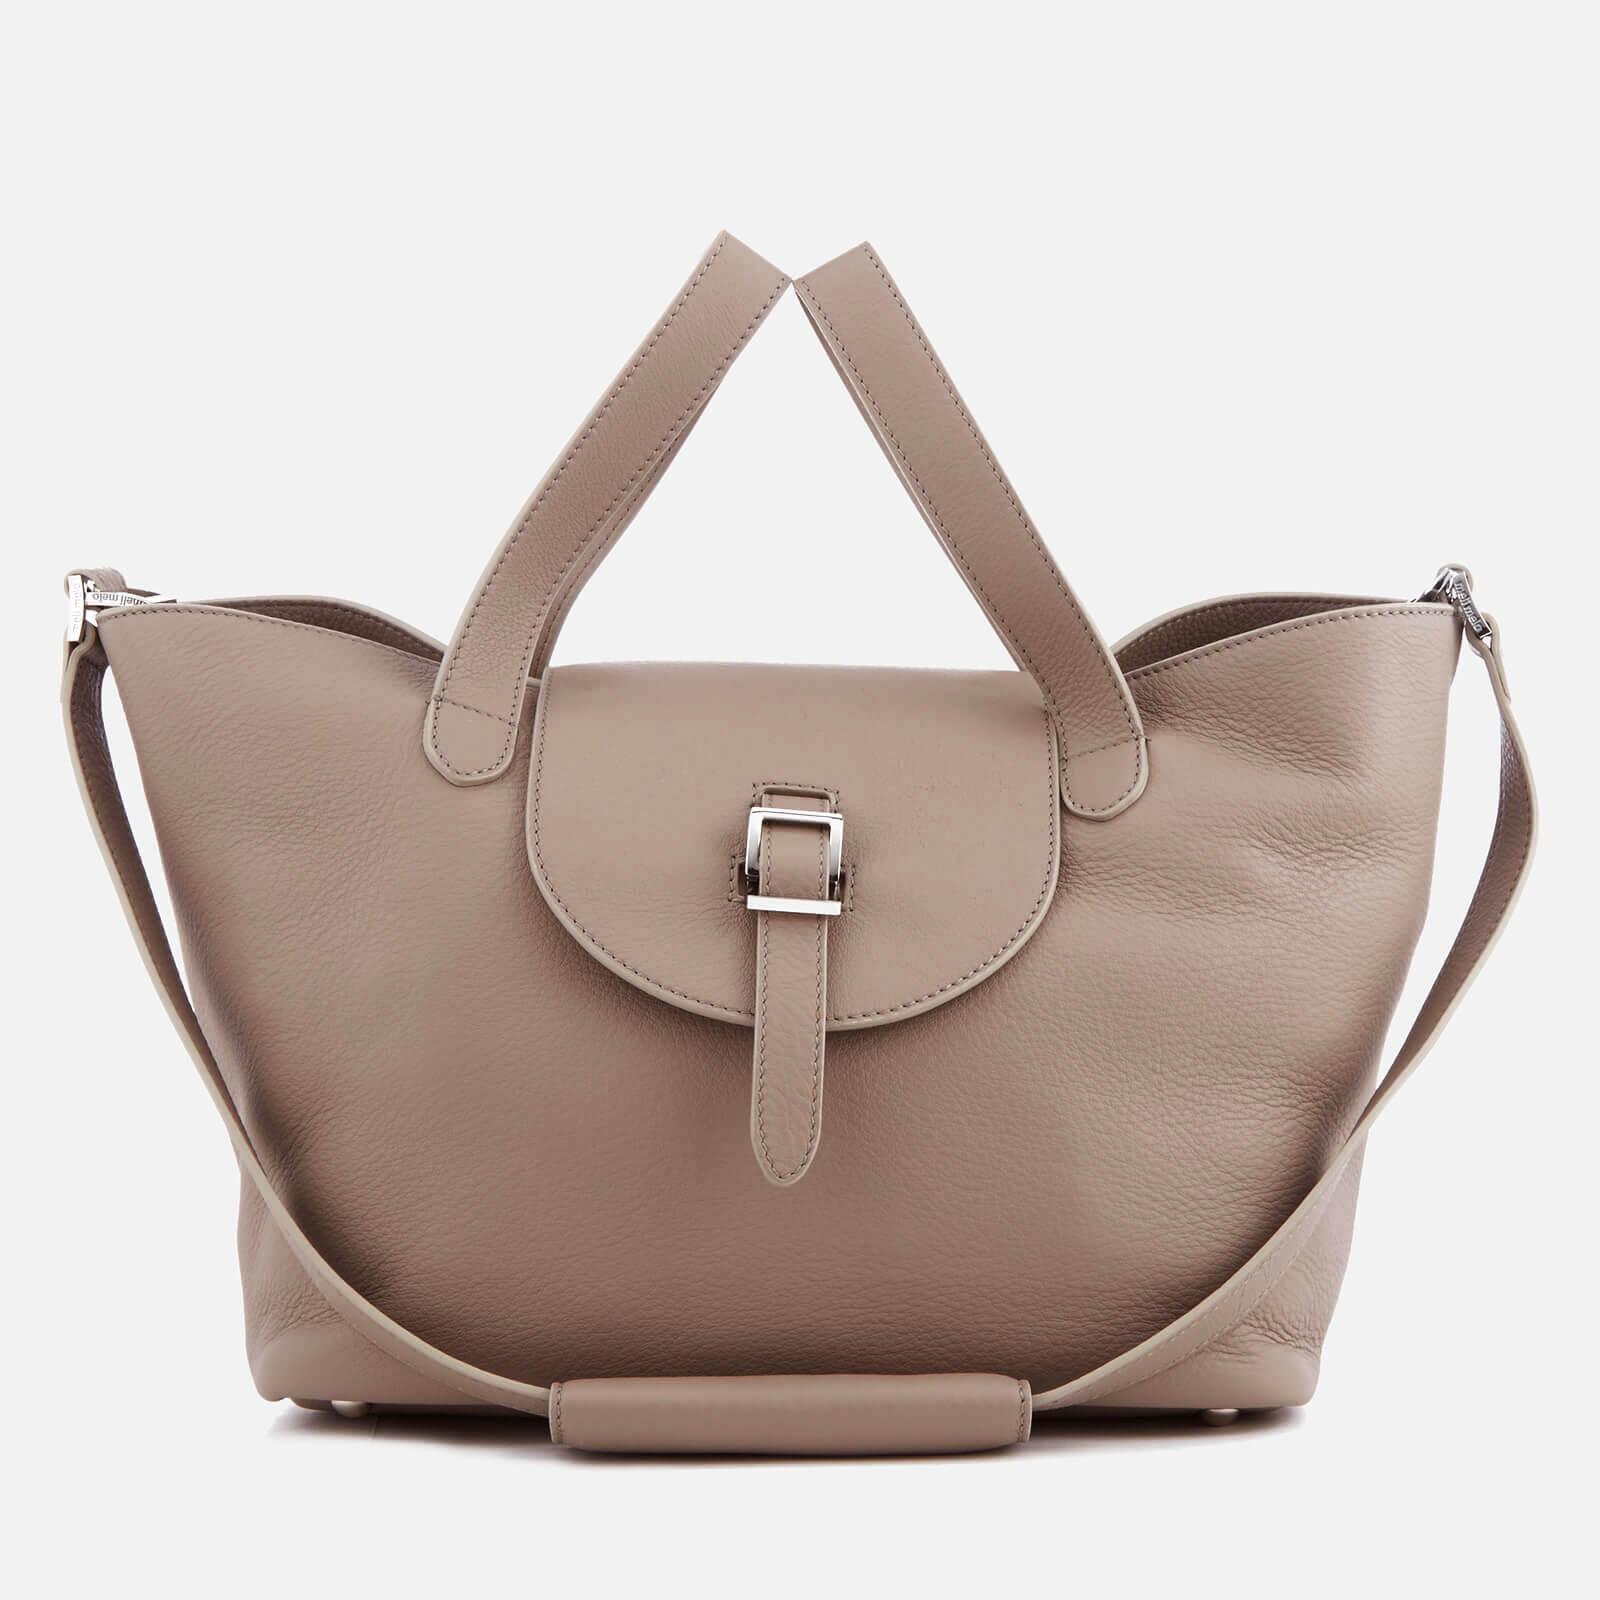 meli melo Women's Thela Medium Tote Bag - Taupe